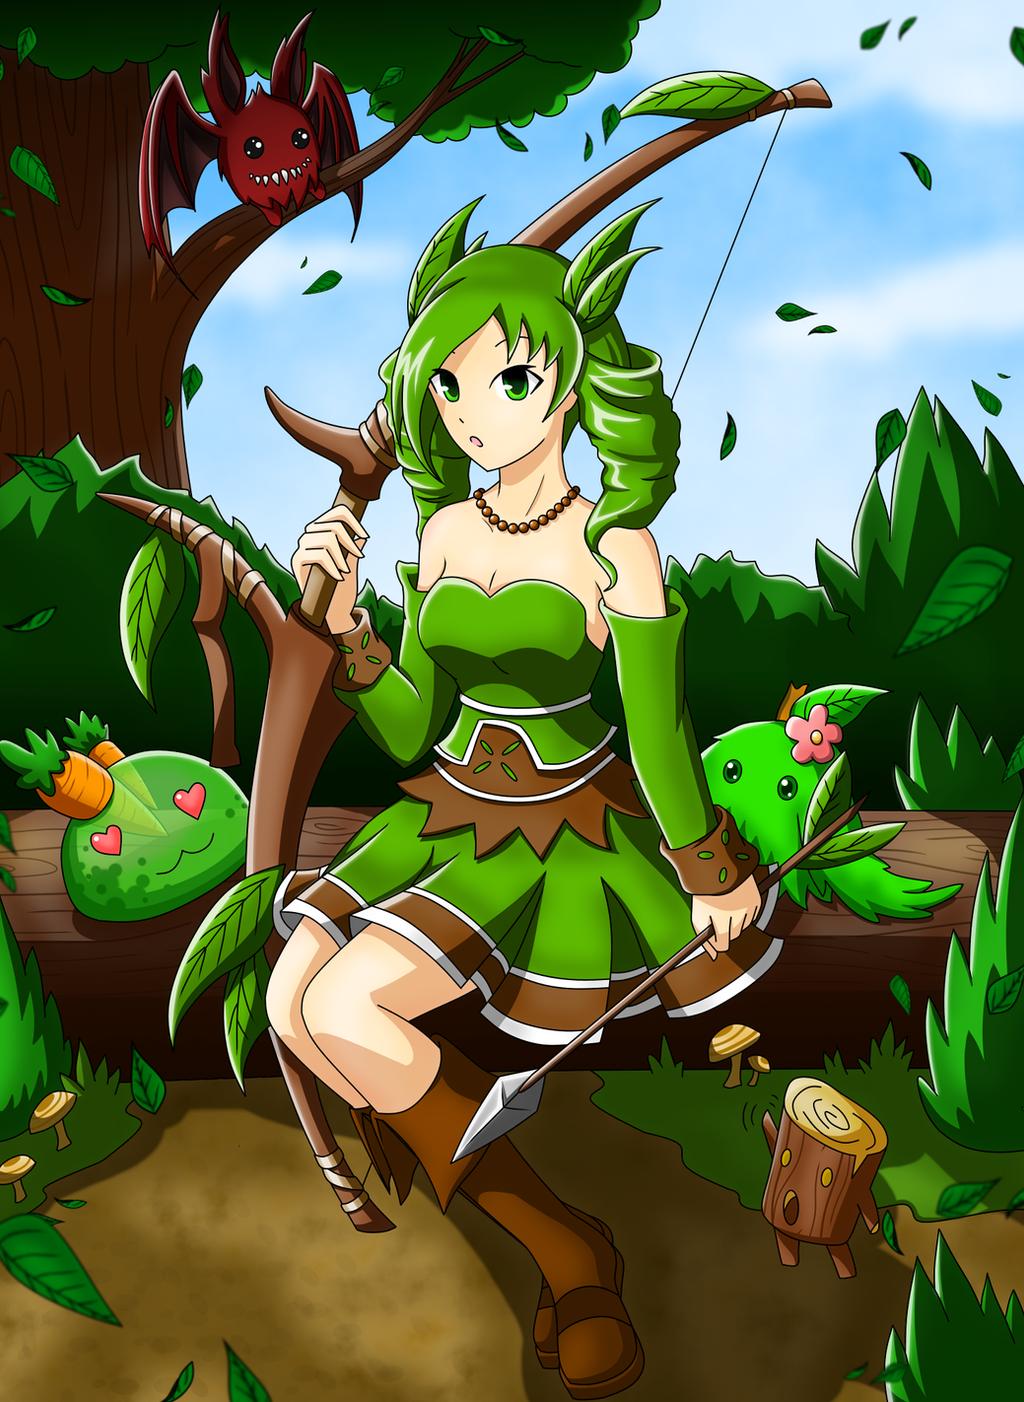 EBF Anna the nature girl by SunnyTheSunFlower